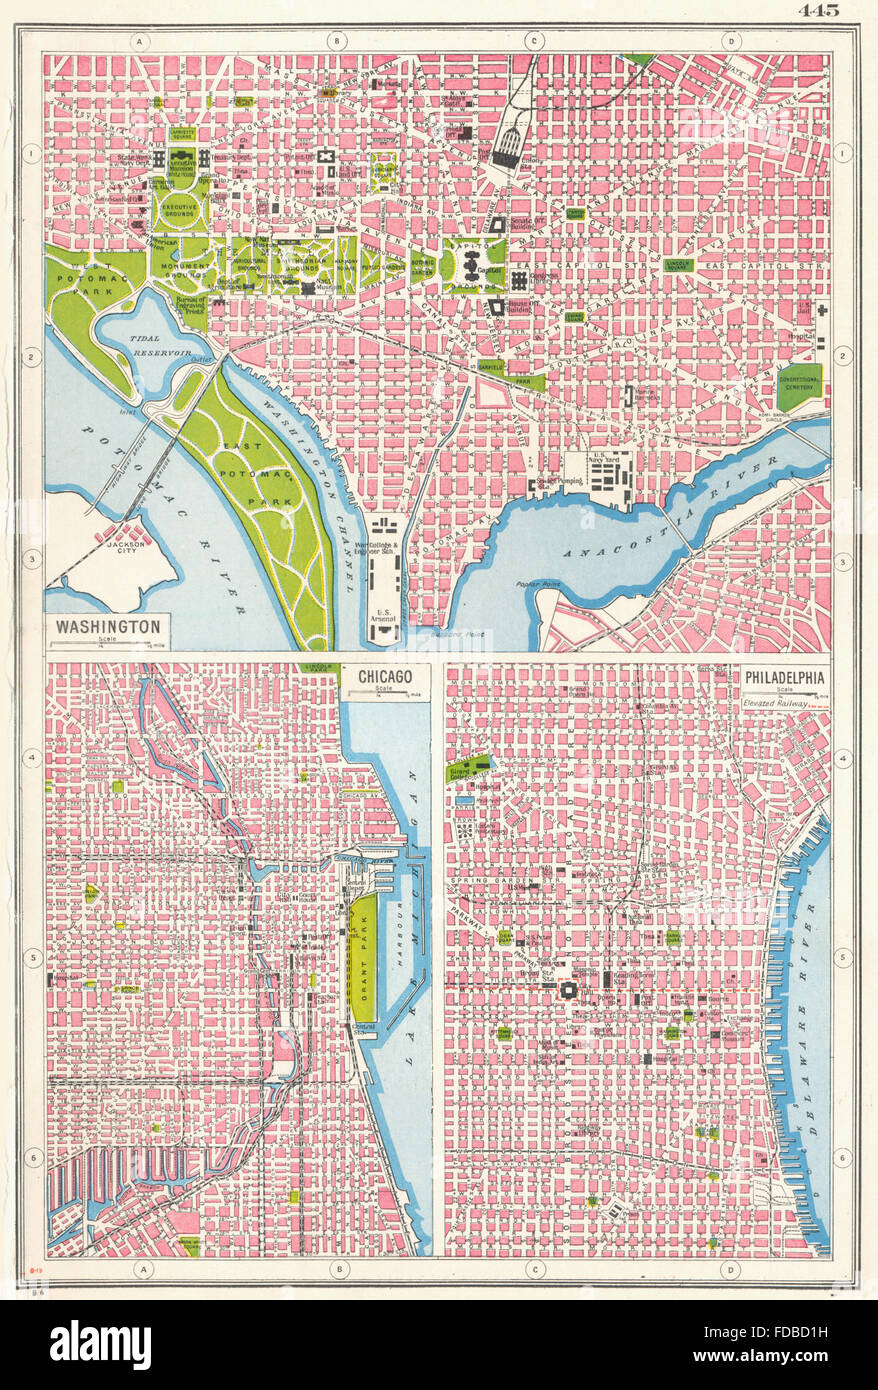 USA CITIES: Washington DC Chicago & Philadelphia city plans, 1920 ...